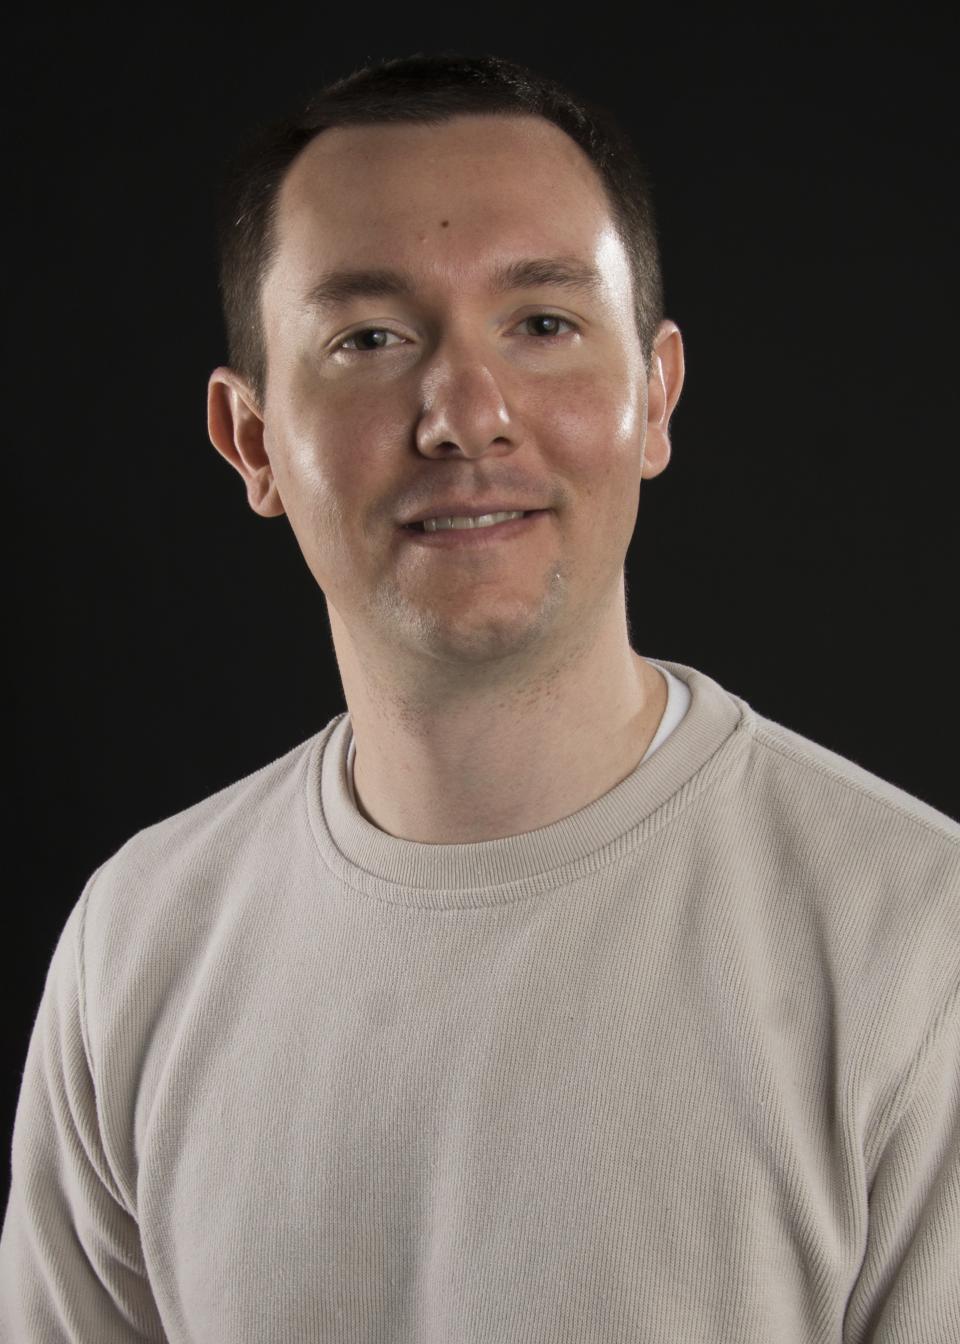 Justin J. Taylor, Ph.D.